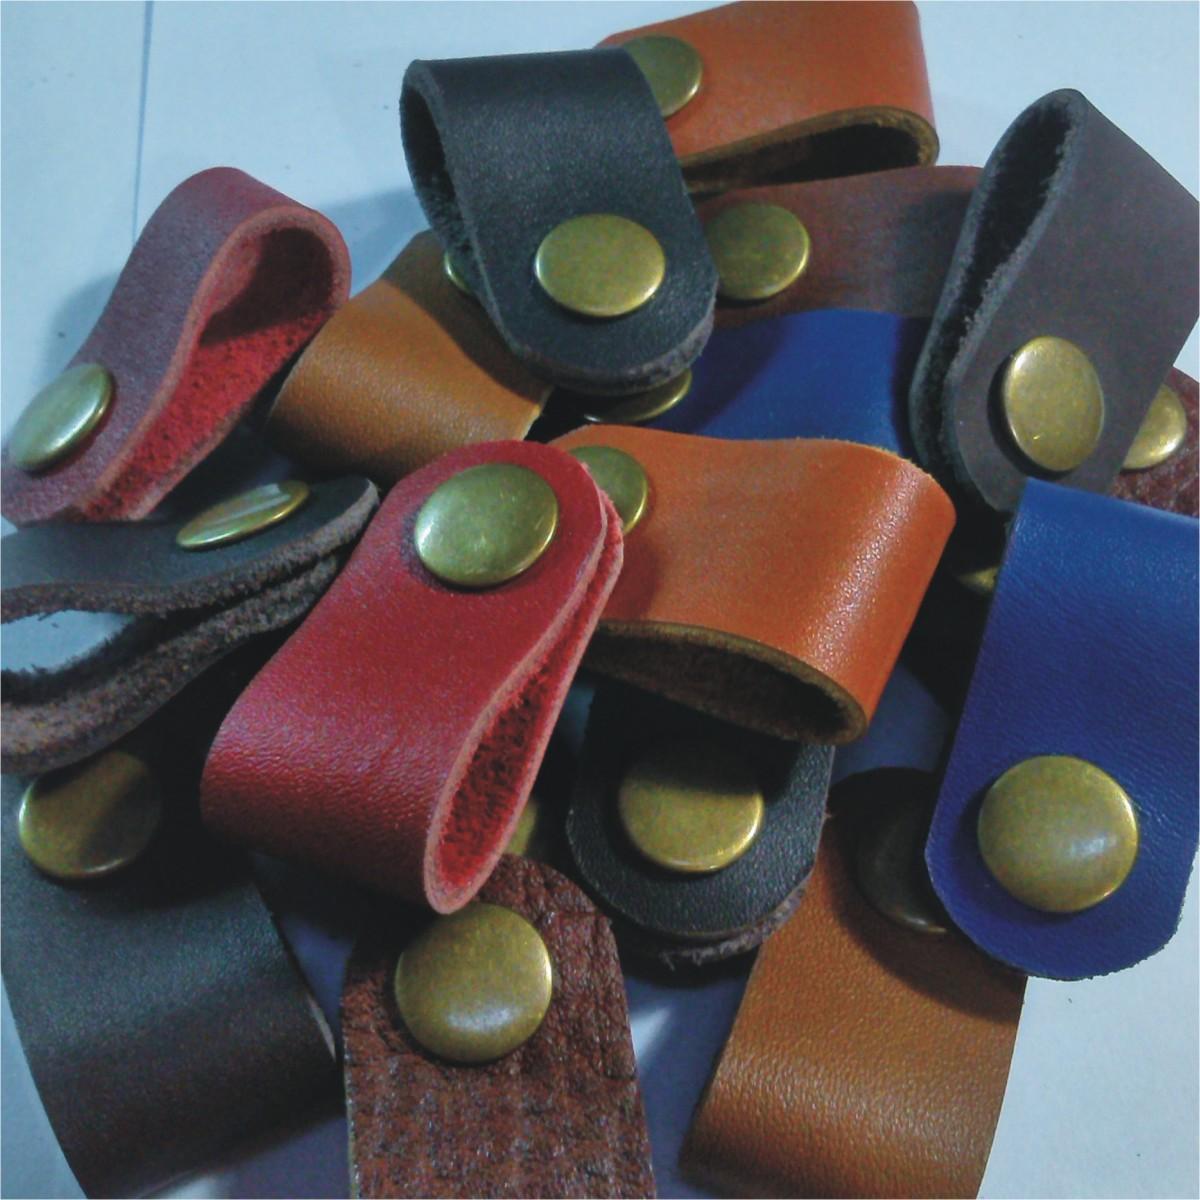 Jual Produk Ukm Klip Kabel Kulit Asli Leather Cable Clips Penjepit Earphone Clip Headset